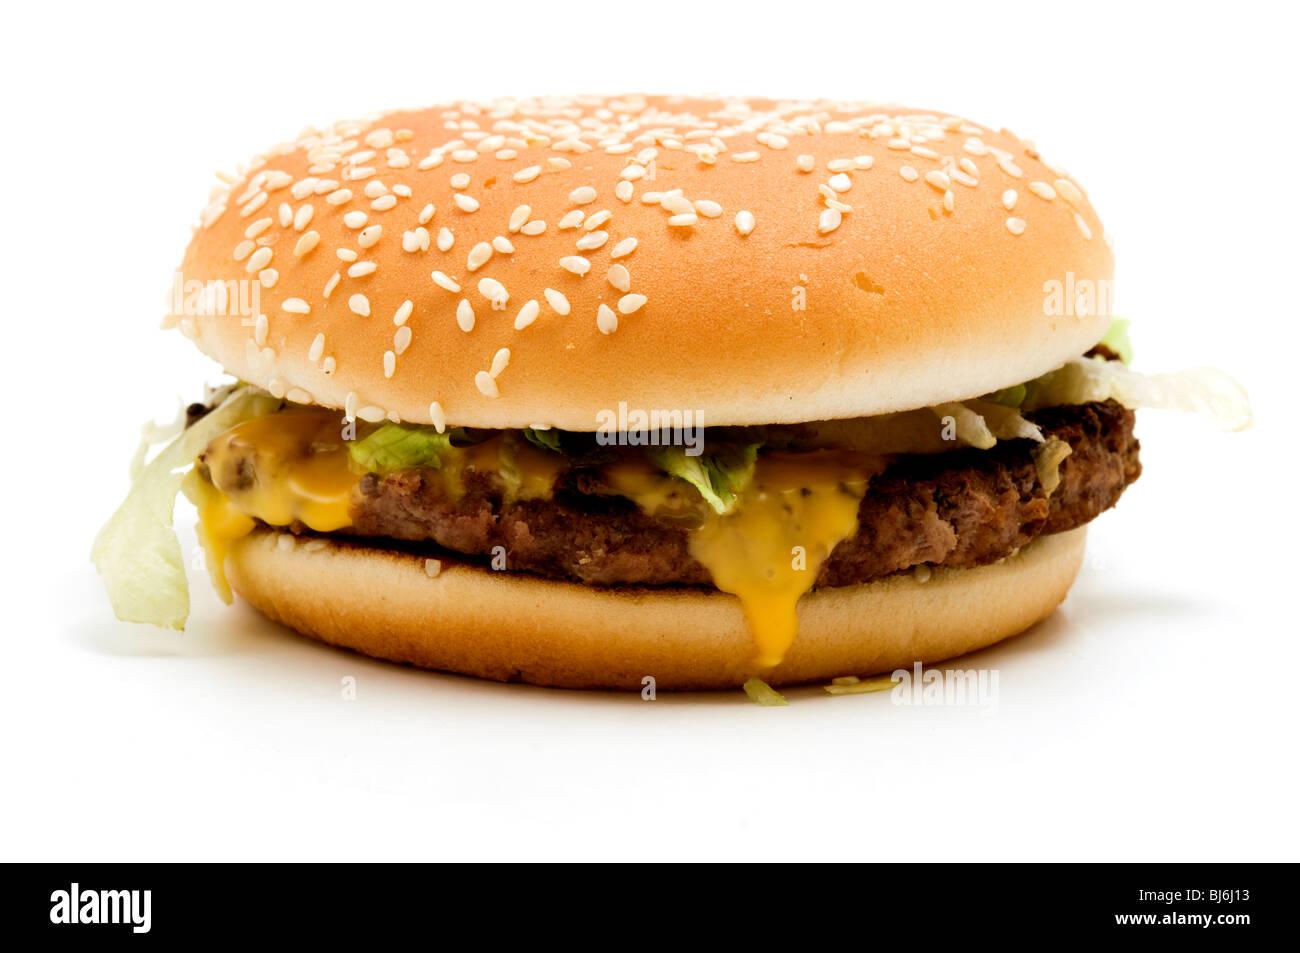 hamburger stockfotos hamburger bilder alamy. Black Bedroom Furniture Sets. Home Design Ideas